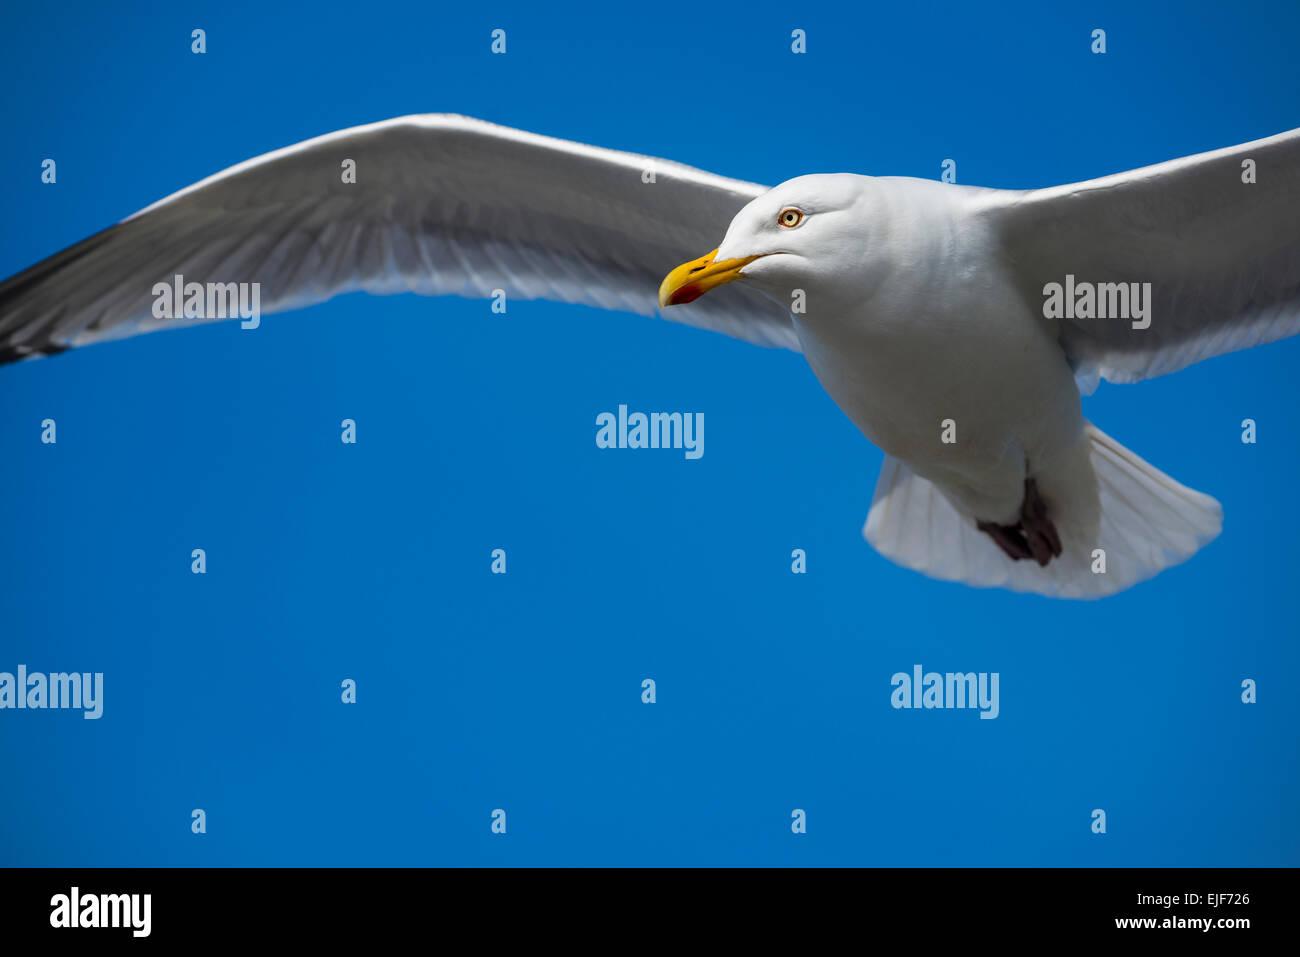 Herring gull gliding - Stock Image